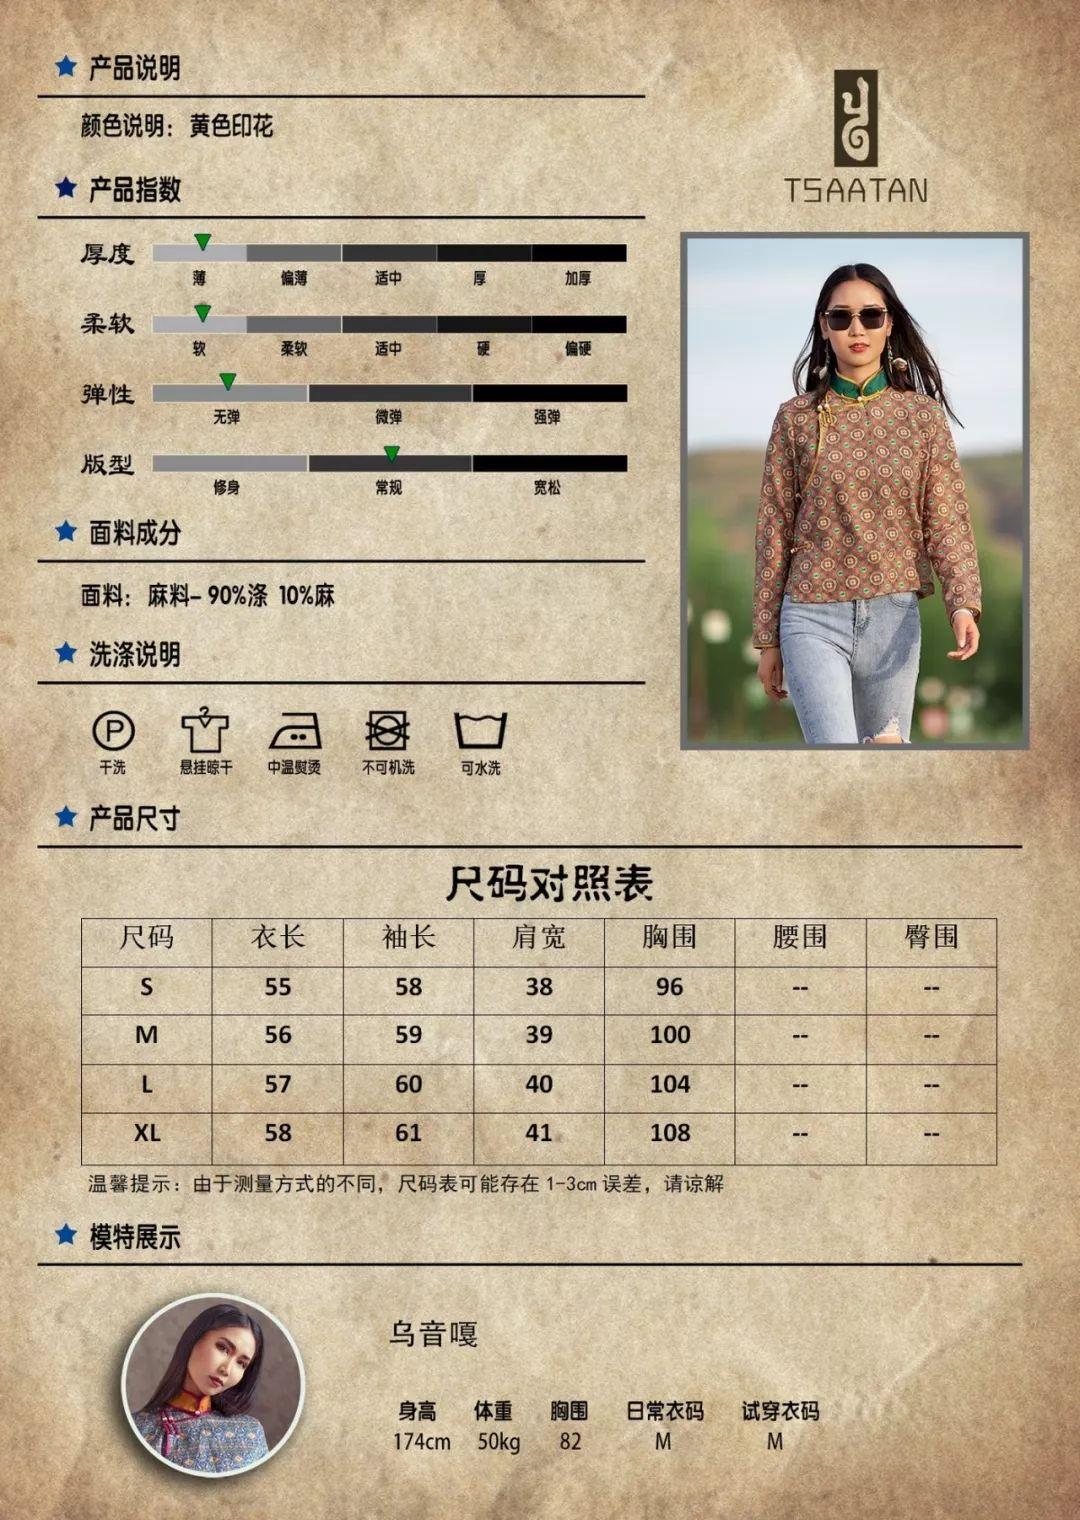 TSAATAN蒙古时装 2019夏季新款首发 第10张